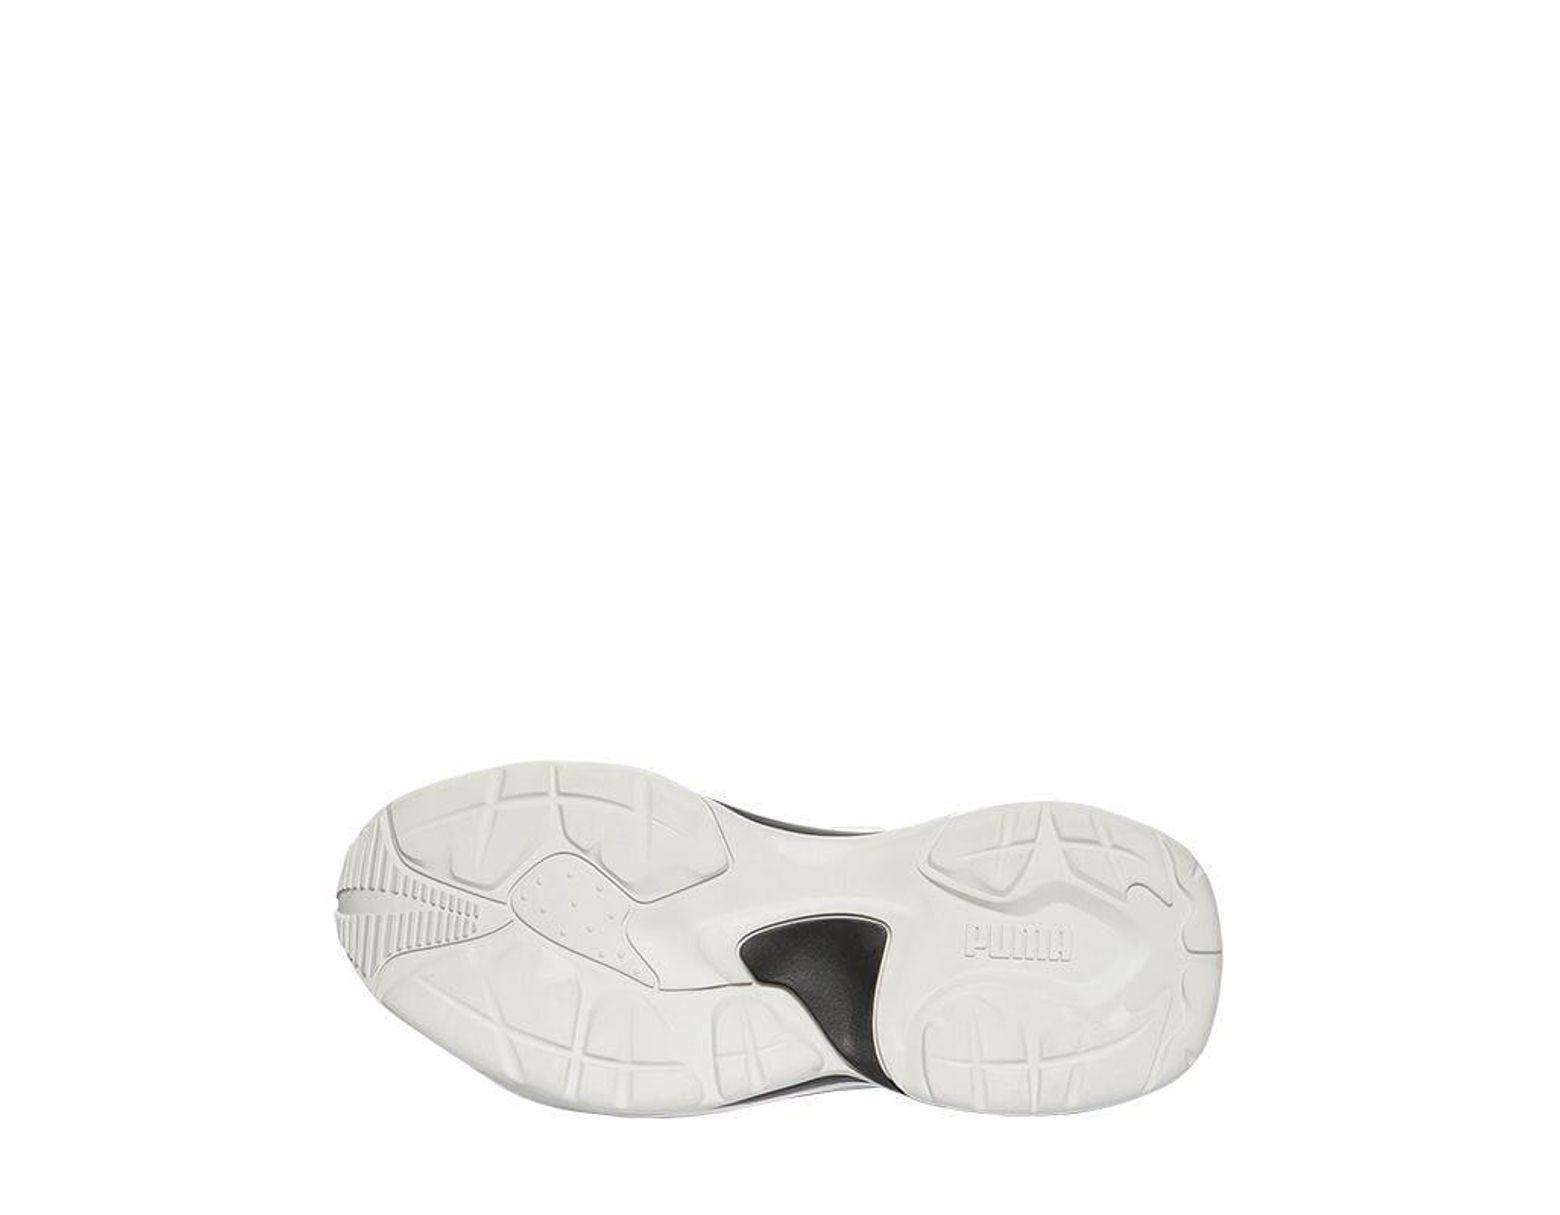 1a0671e97b09 puma-select-LagoonOrchid-Thunder-Rive-Gauche-Sneakers.jpeg